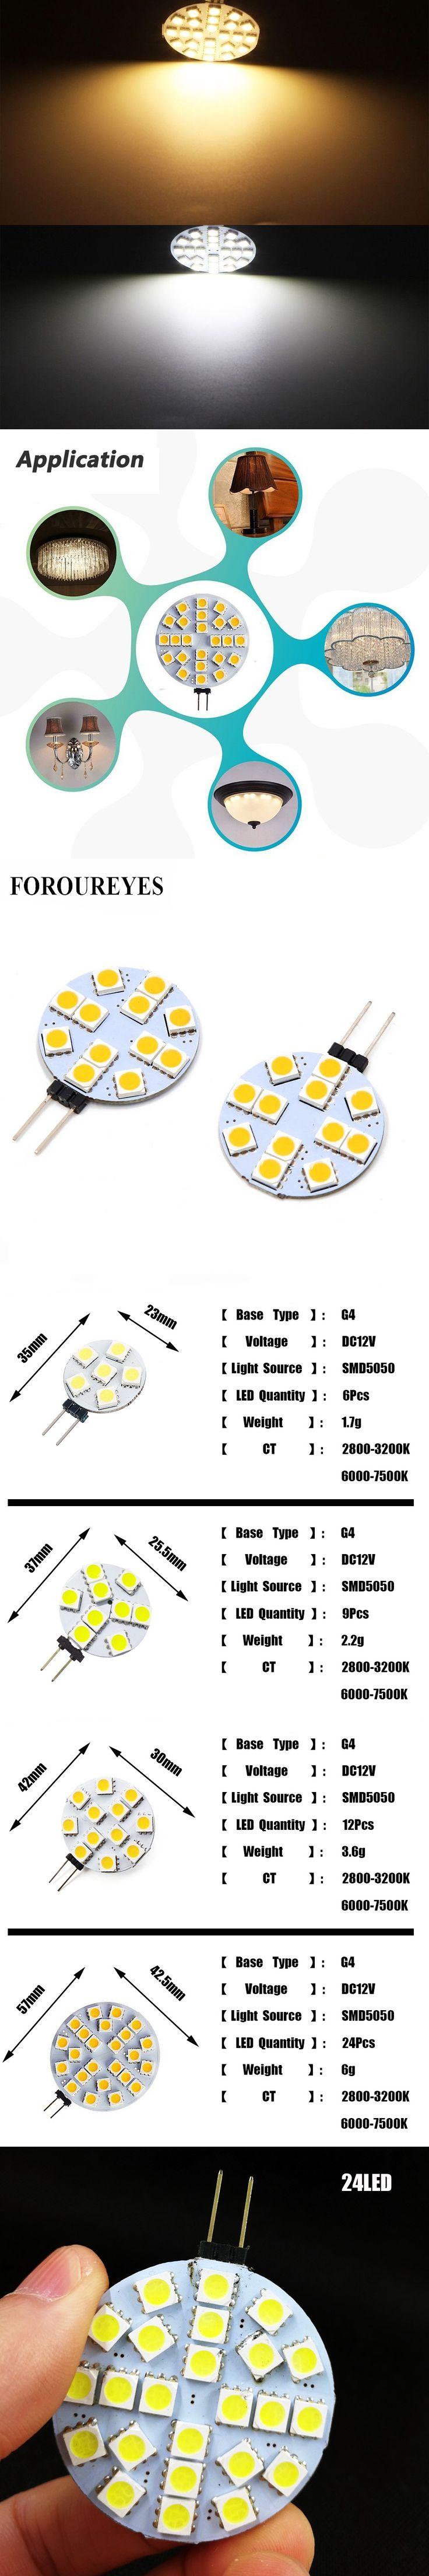 G4 LED Round Range Hood Bulb 12v SMD5050 6/9/12/24 leds Car-styling LED Boat Light White / Warm White Bulb Lamp High brightness